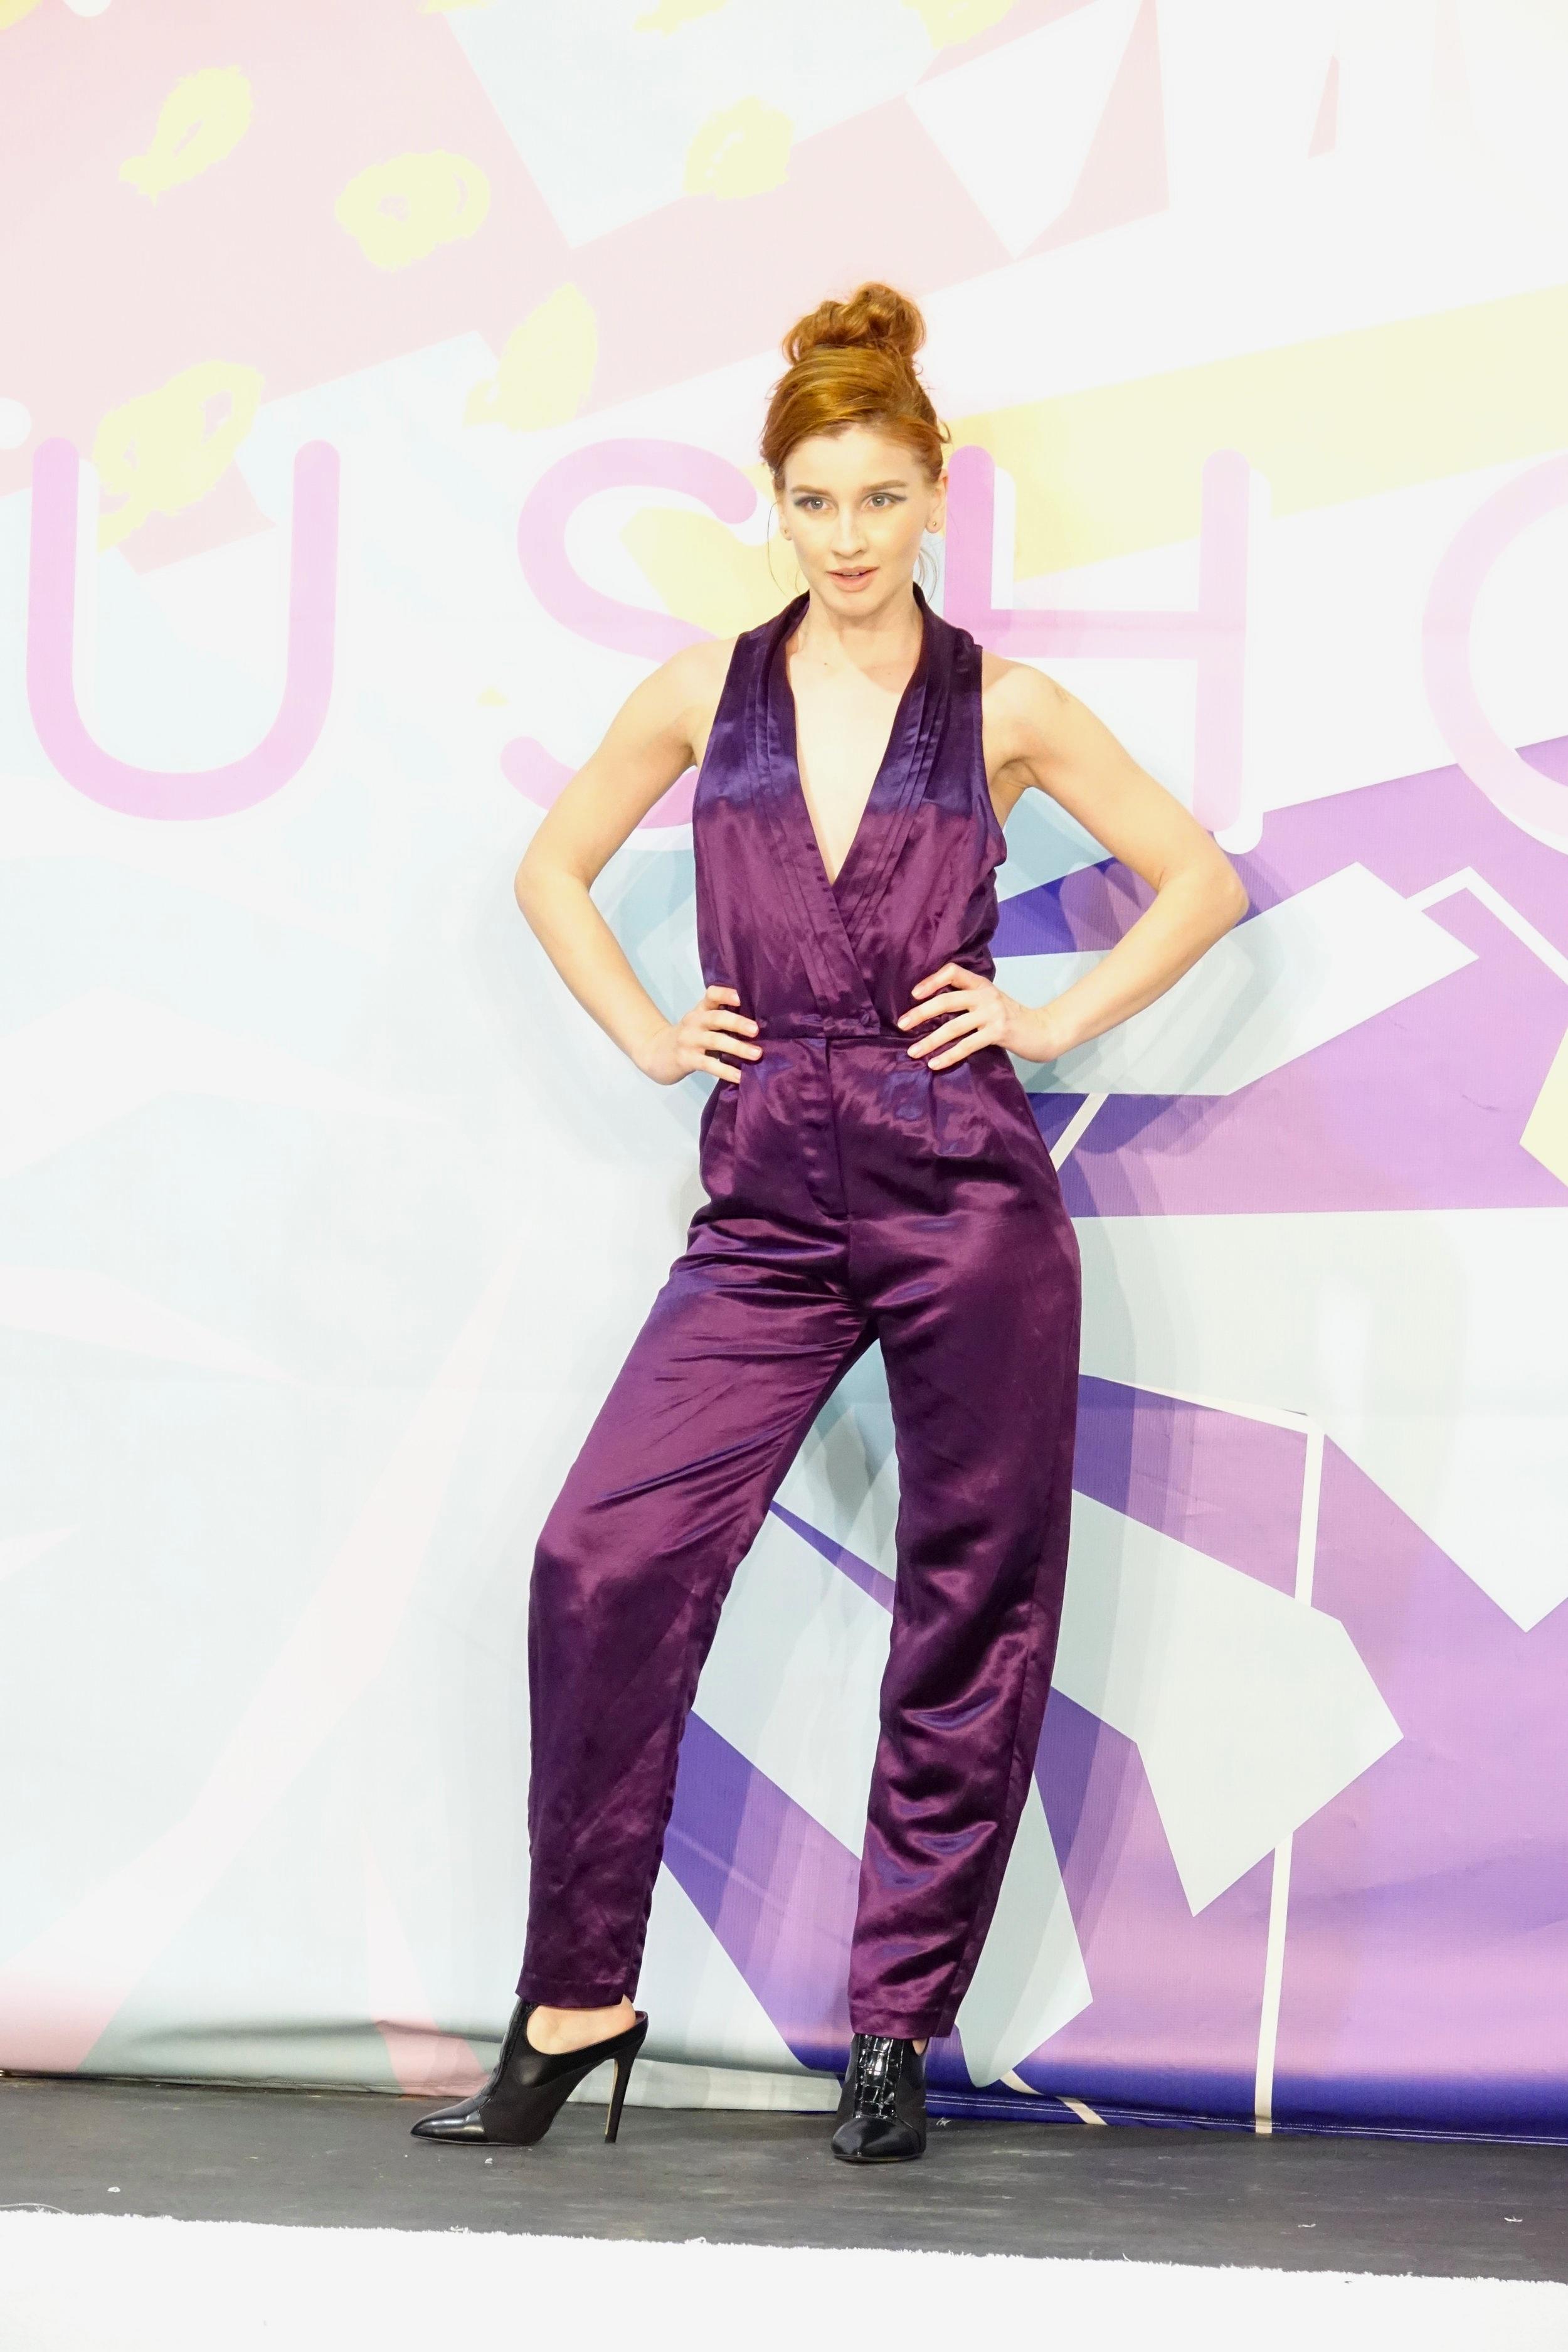 Model: Anna Smyczynski